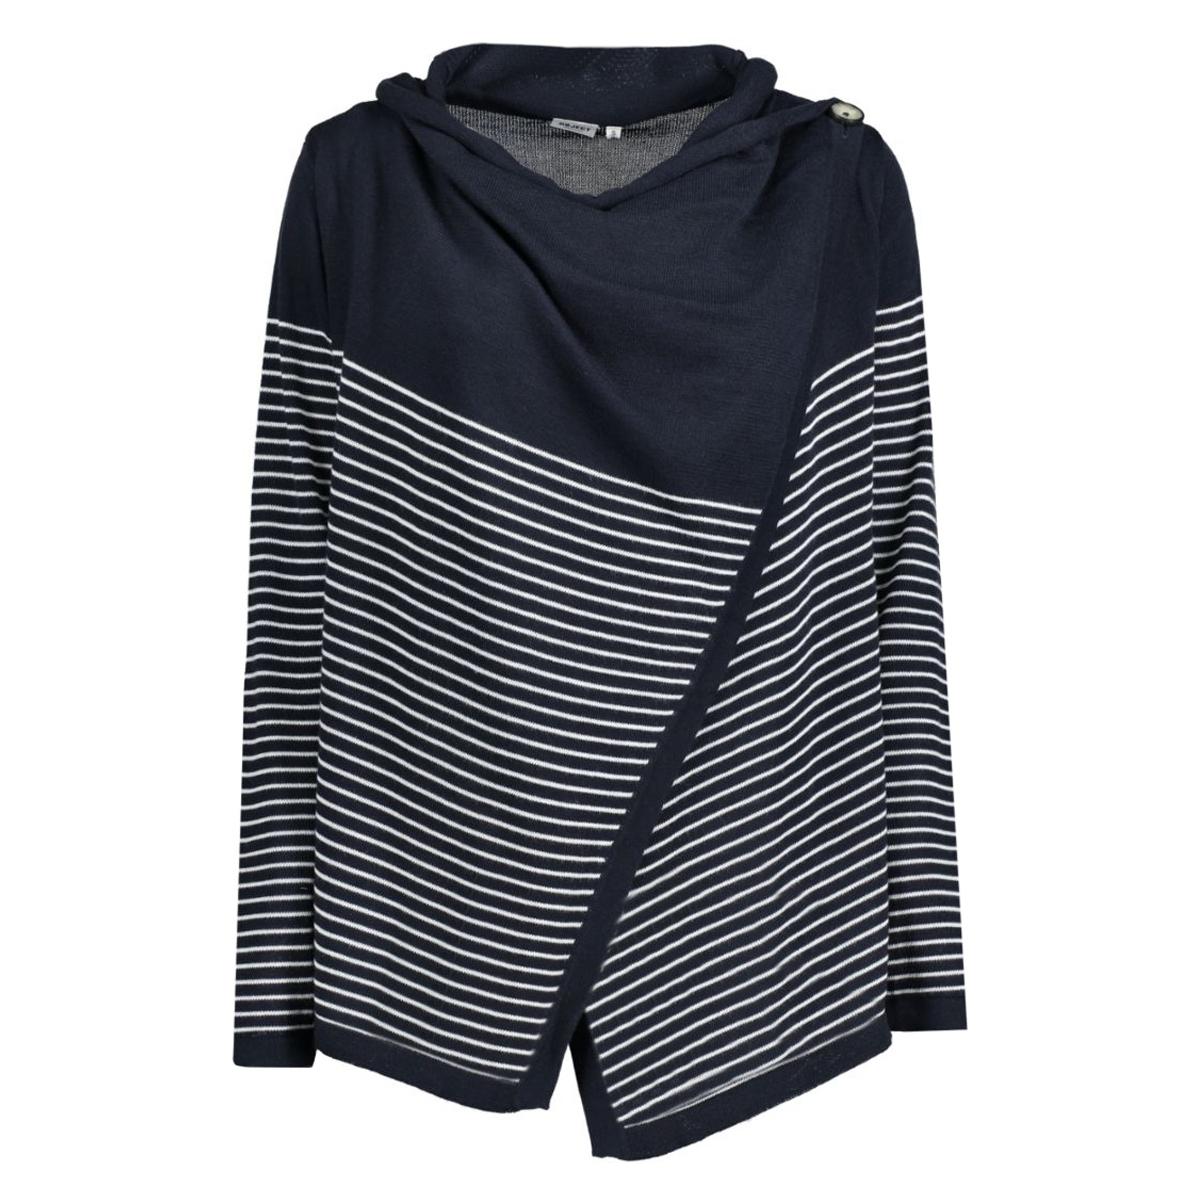 objanna deanna light knit cardigan 23023999 object vest sky captain